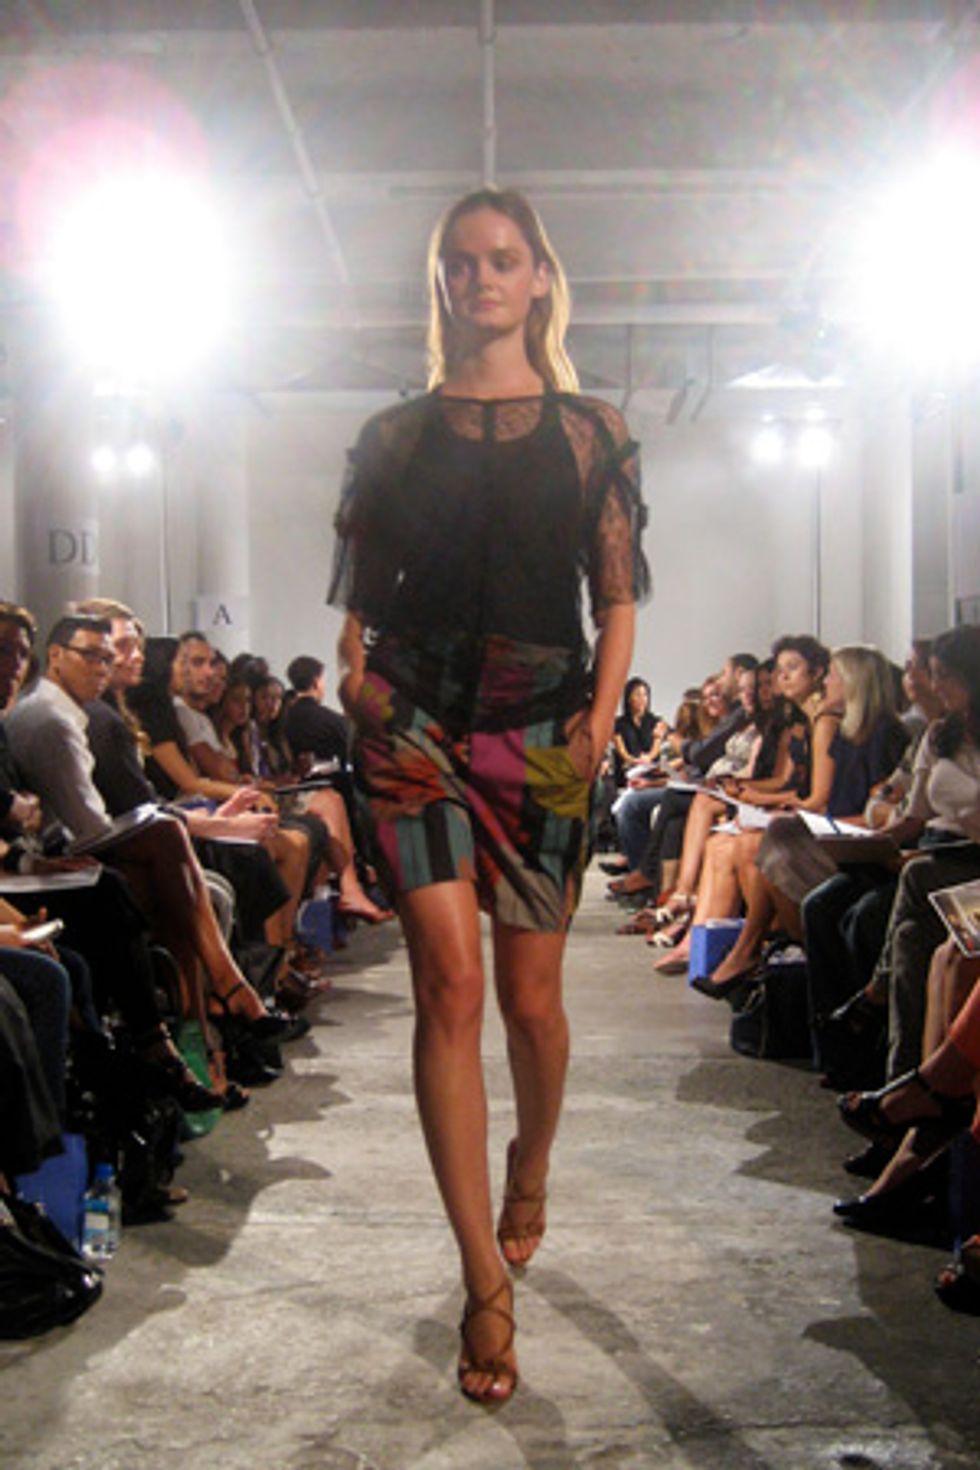 Fashion Week Re-Cap: Sari Gueron, Catherine Malandrino, Chris Benz and More